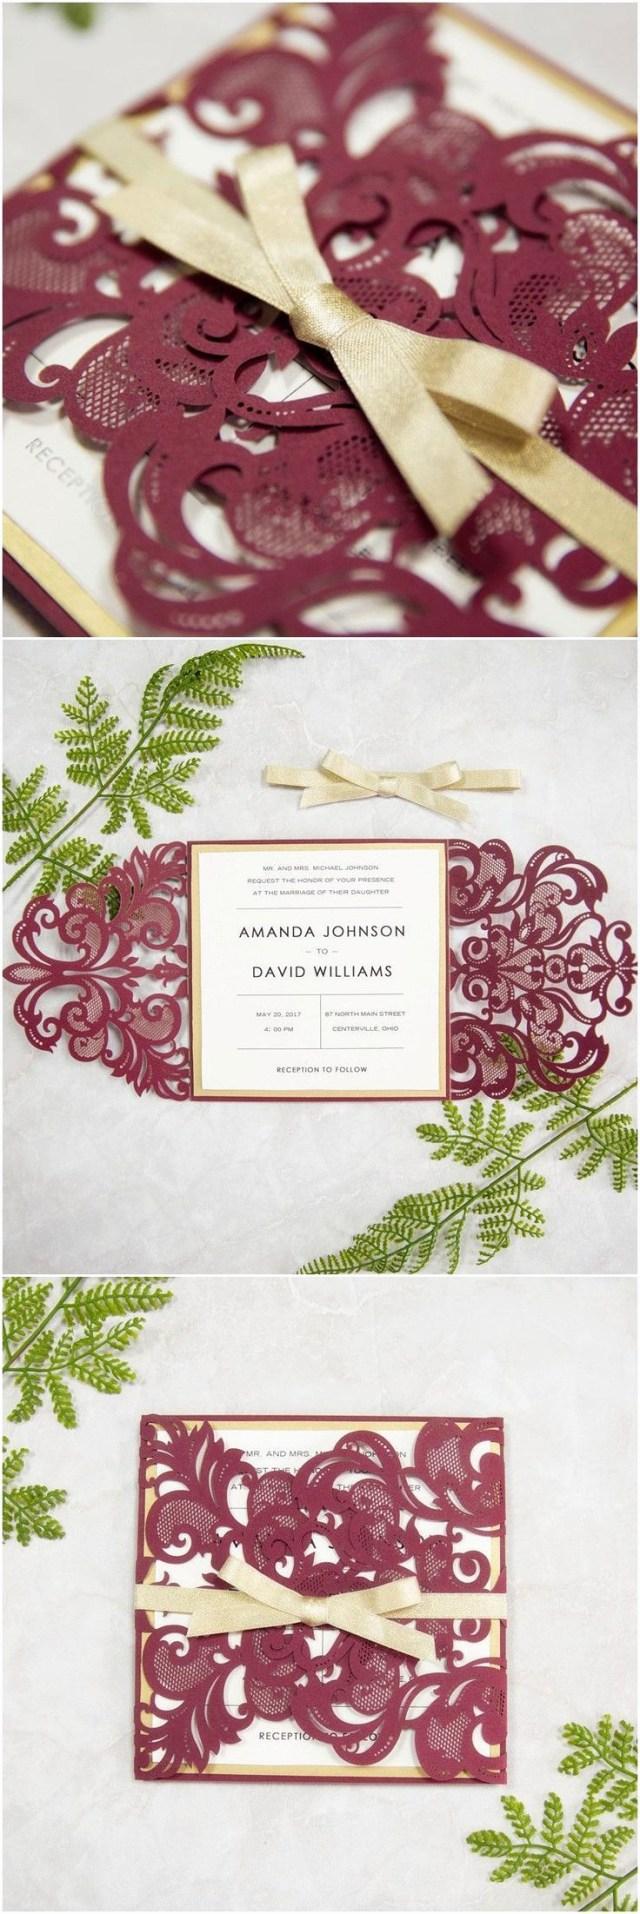 Cricut Wedding Ideas Cricut Invitation Ideas Best Of Wedding Box Invitations Svg Dxf Ai